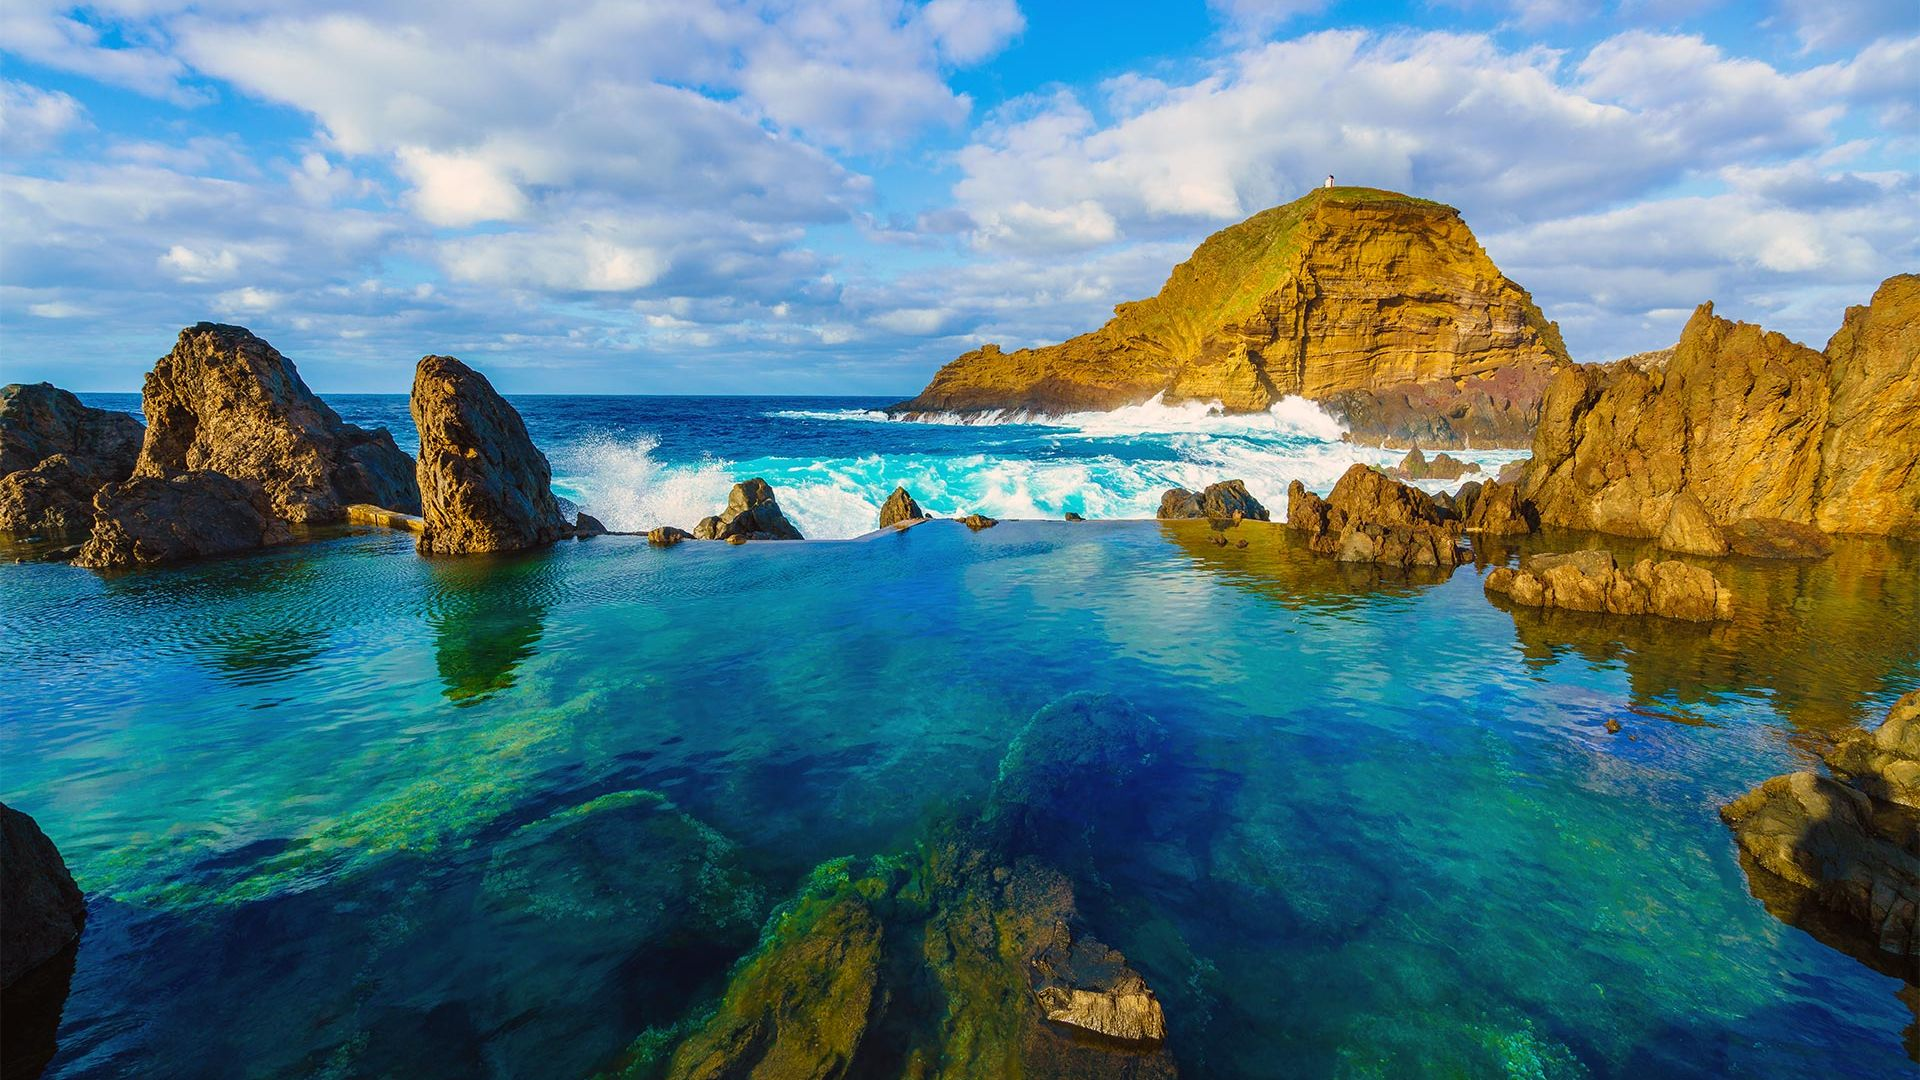 Sejur plaja Savoy Signature Madeira, 8 zile - 31 iulie 2021